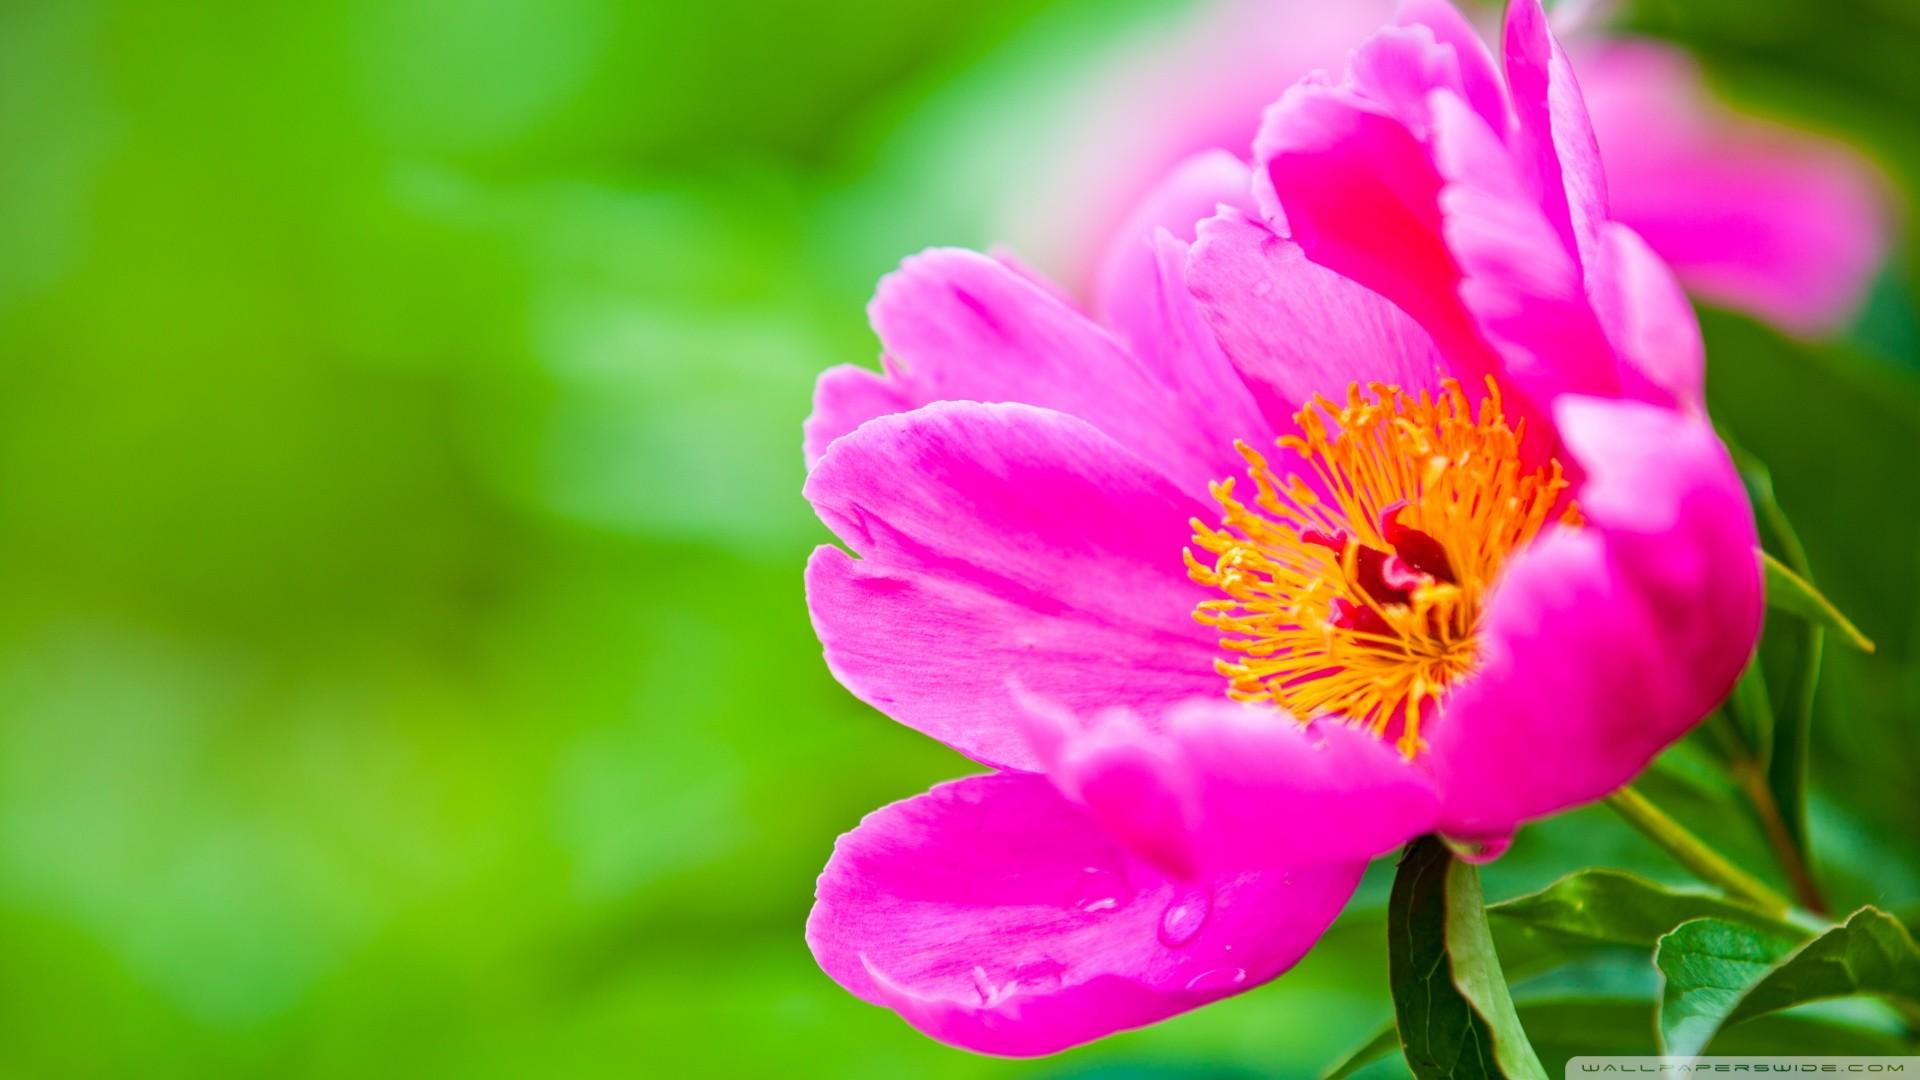 Pink Flower Wallpaper (74+ images)